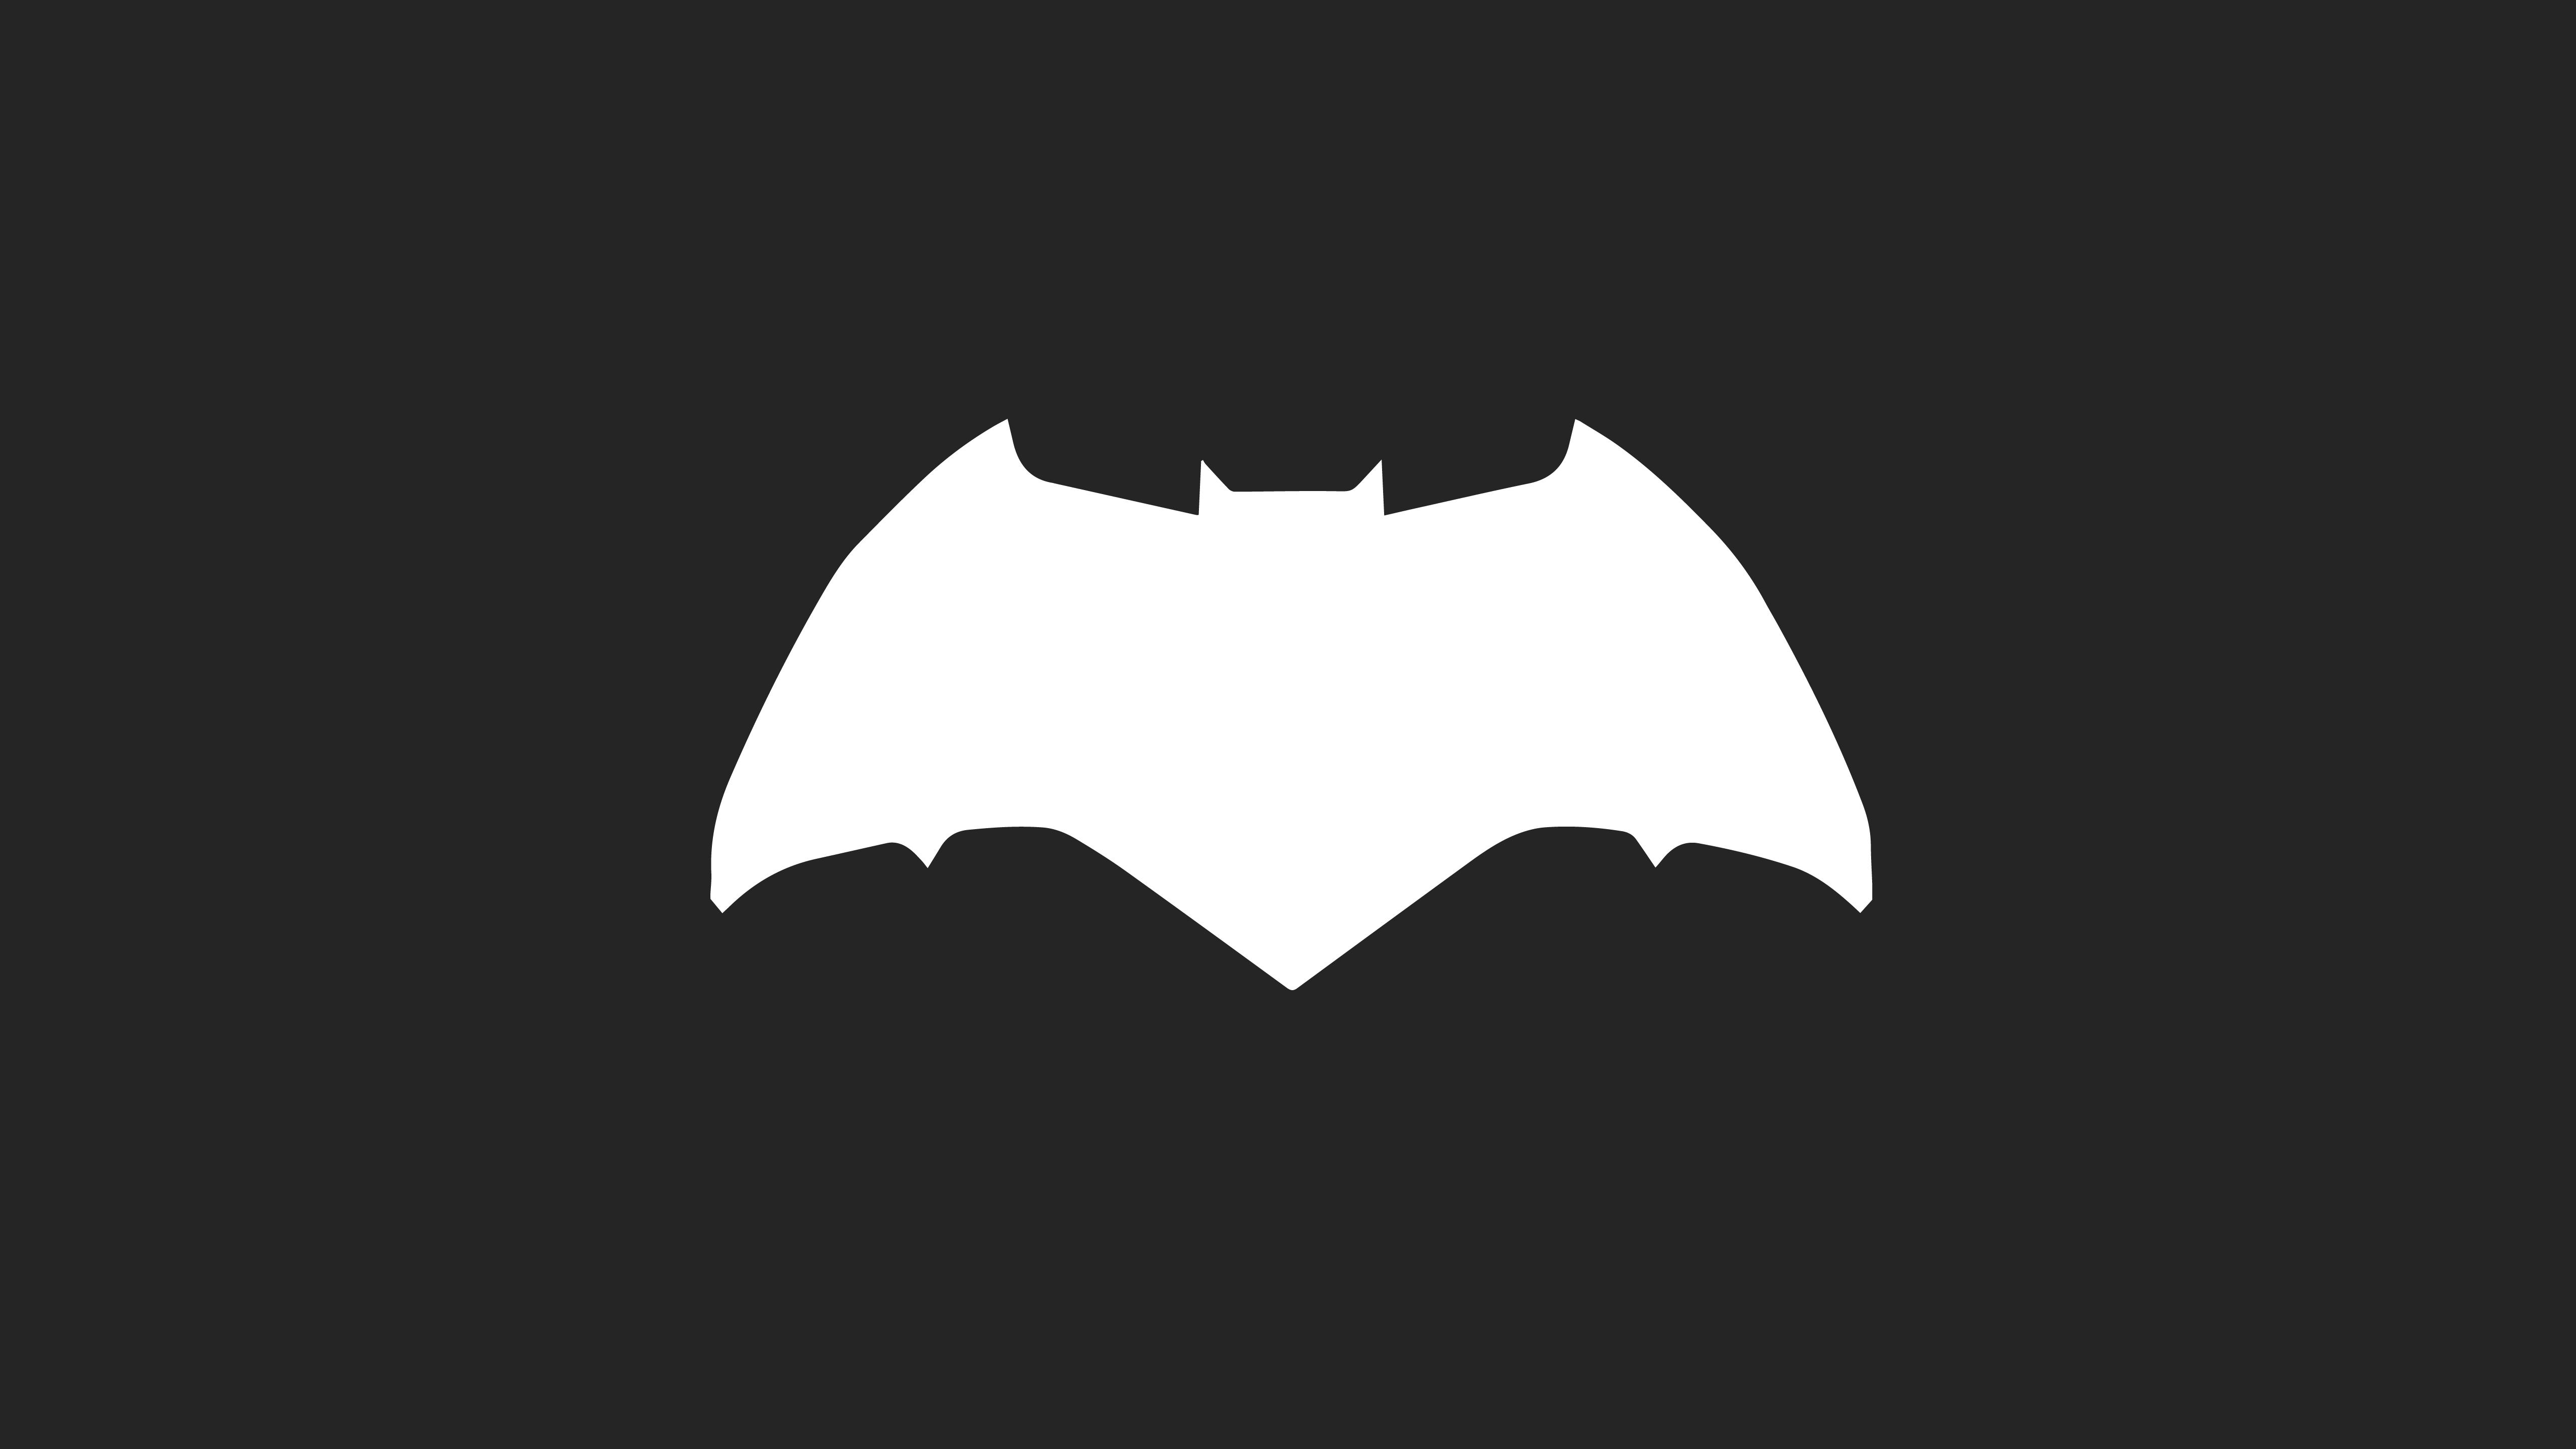 Batman Logo Minimalism HD Artist 4k Wallpapers Images